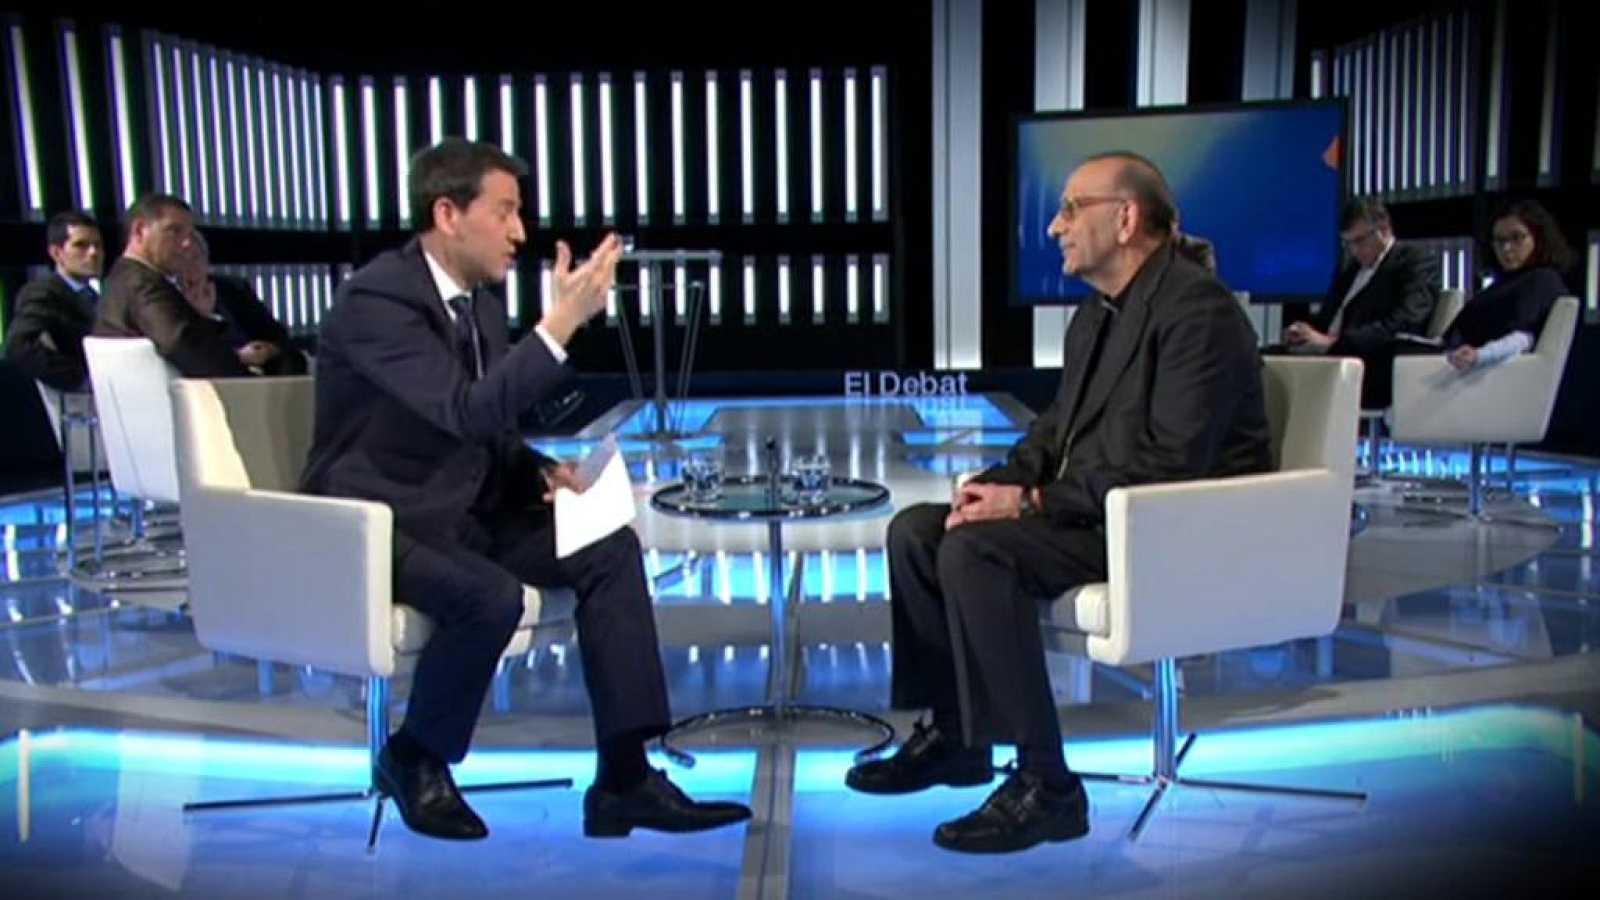 El Debat de La 1 - Juan José Omella, arquebisbe de Barcelona - Avanç